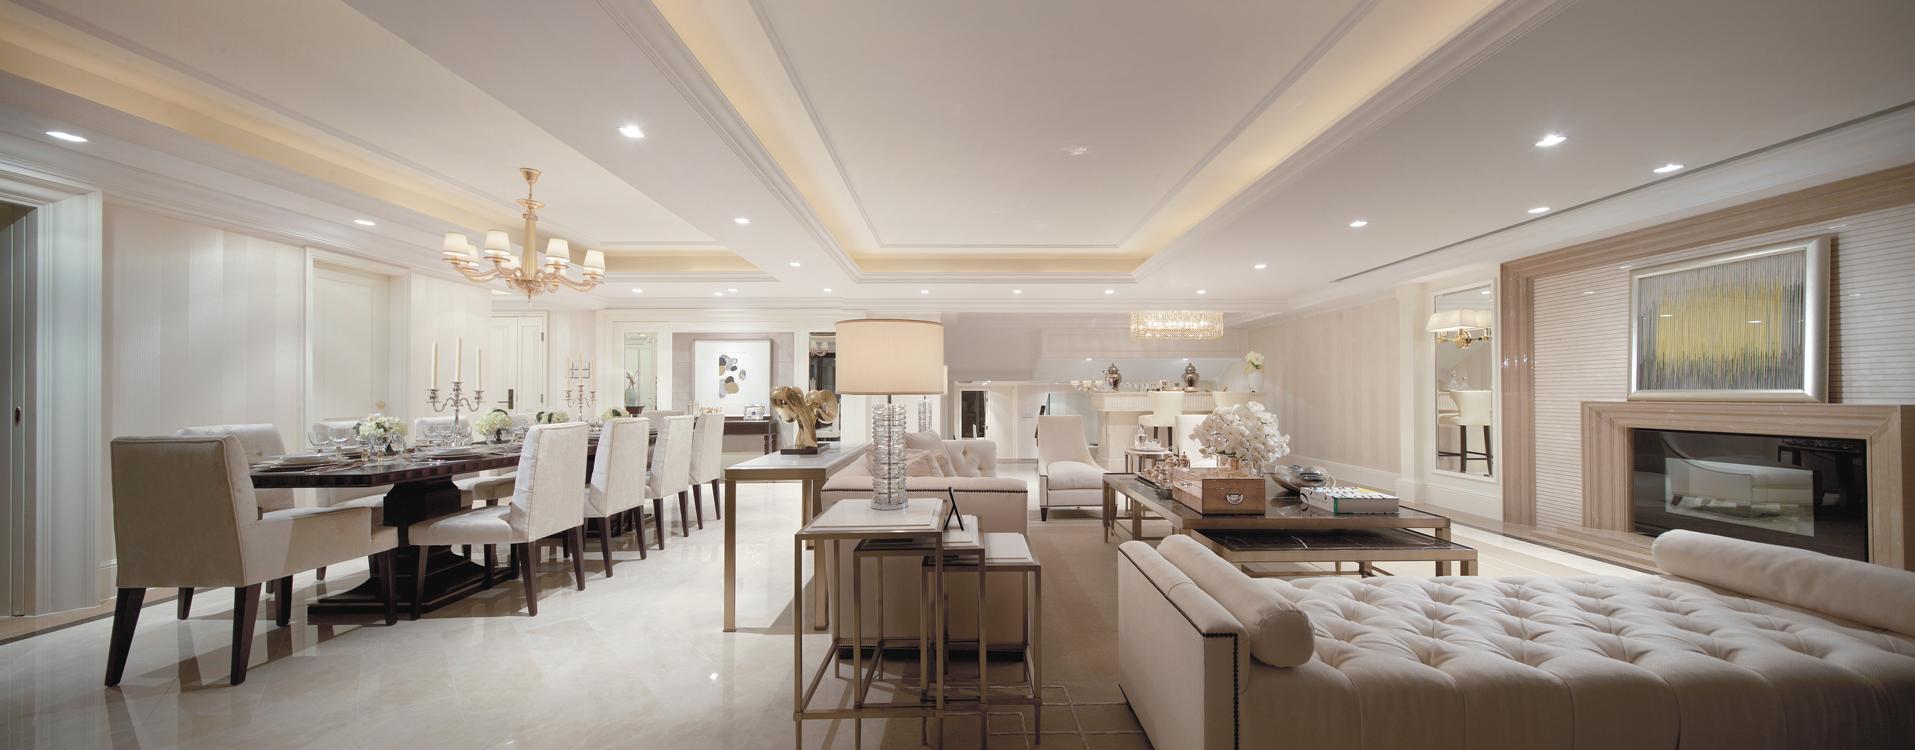 luxury interior-005.png